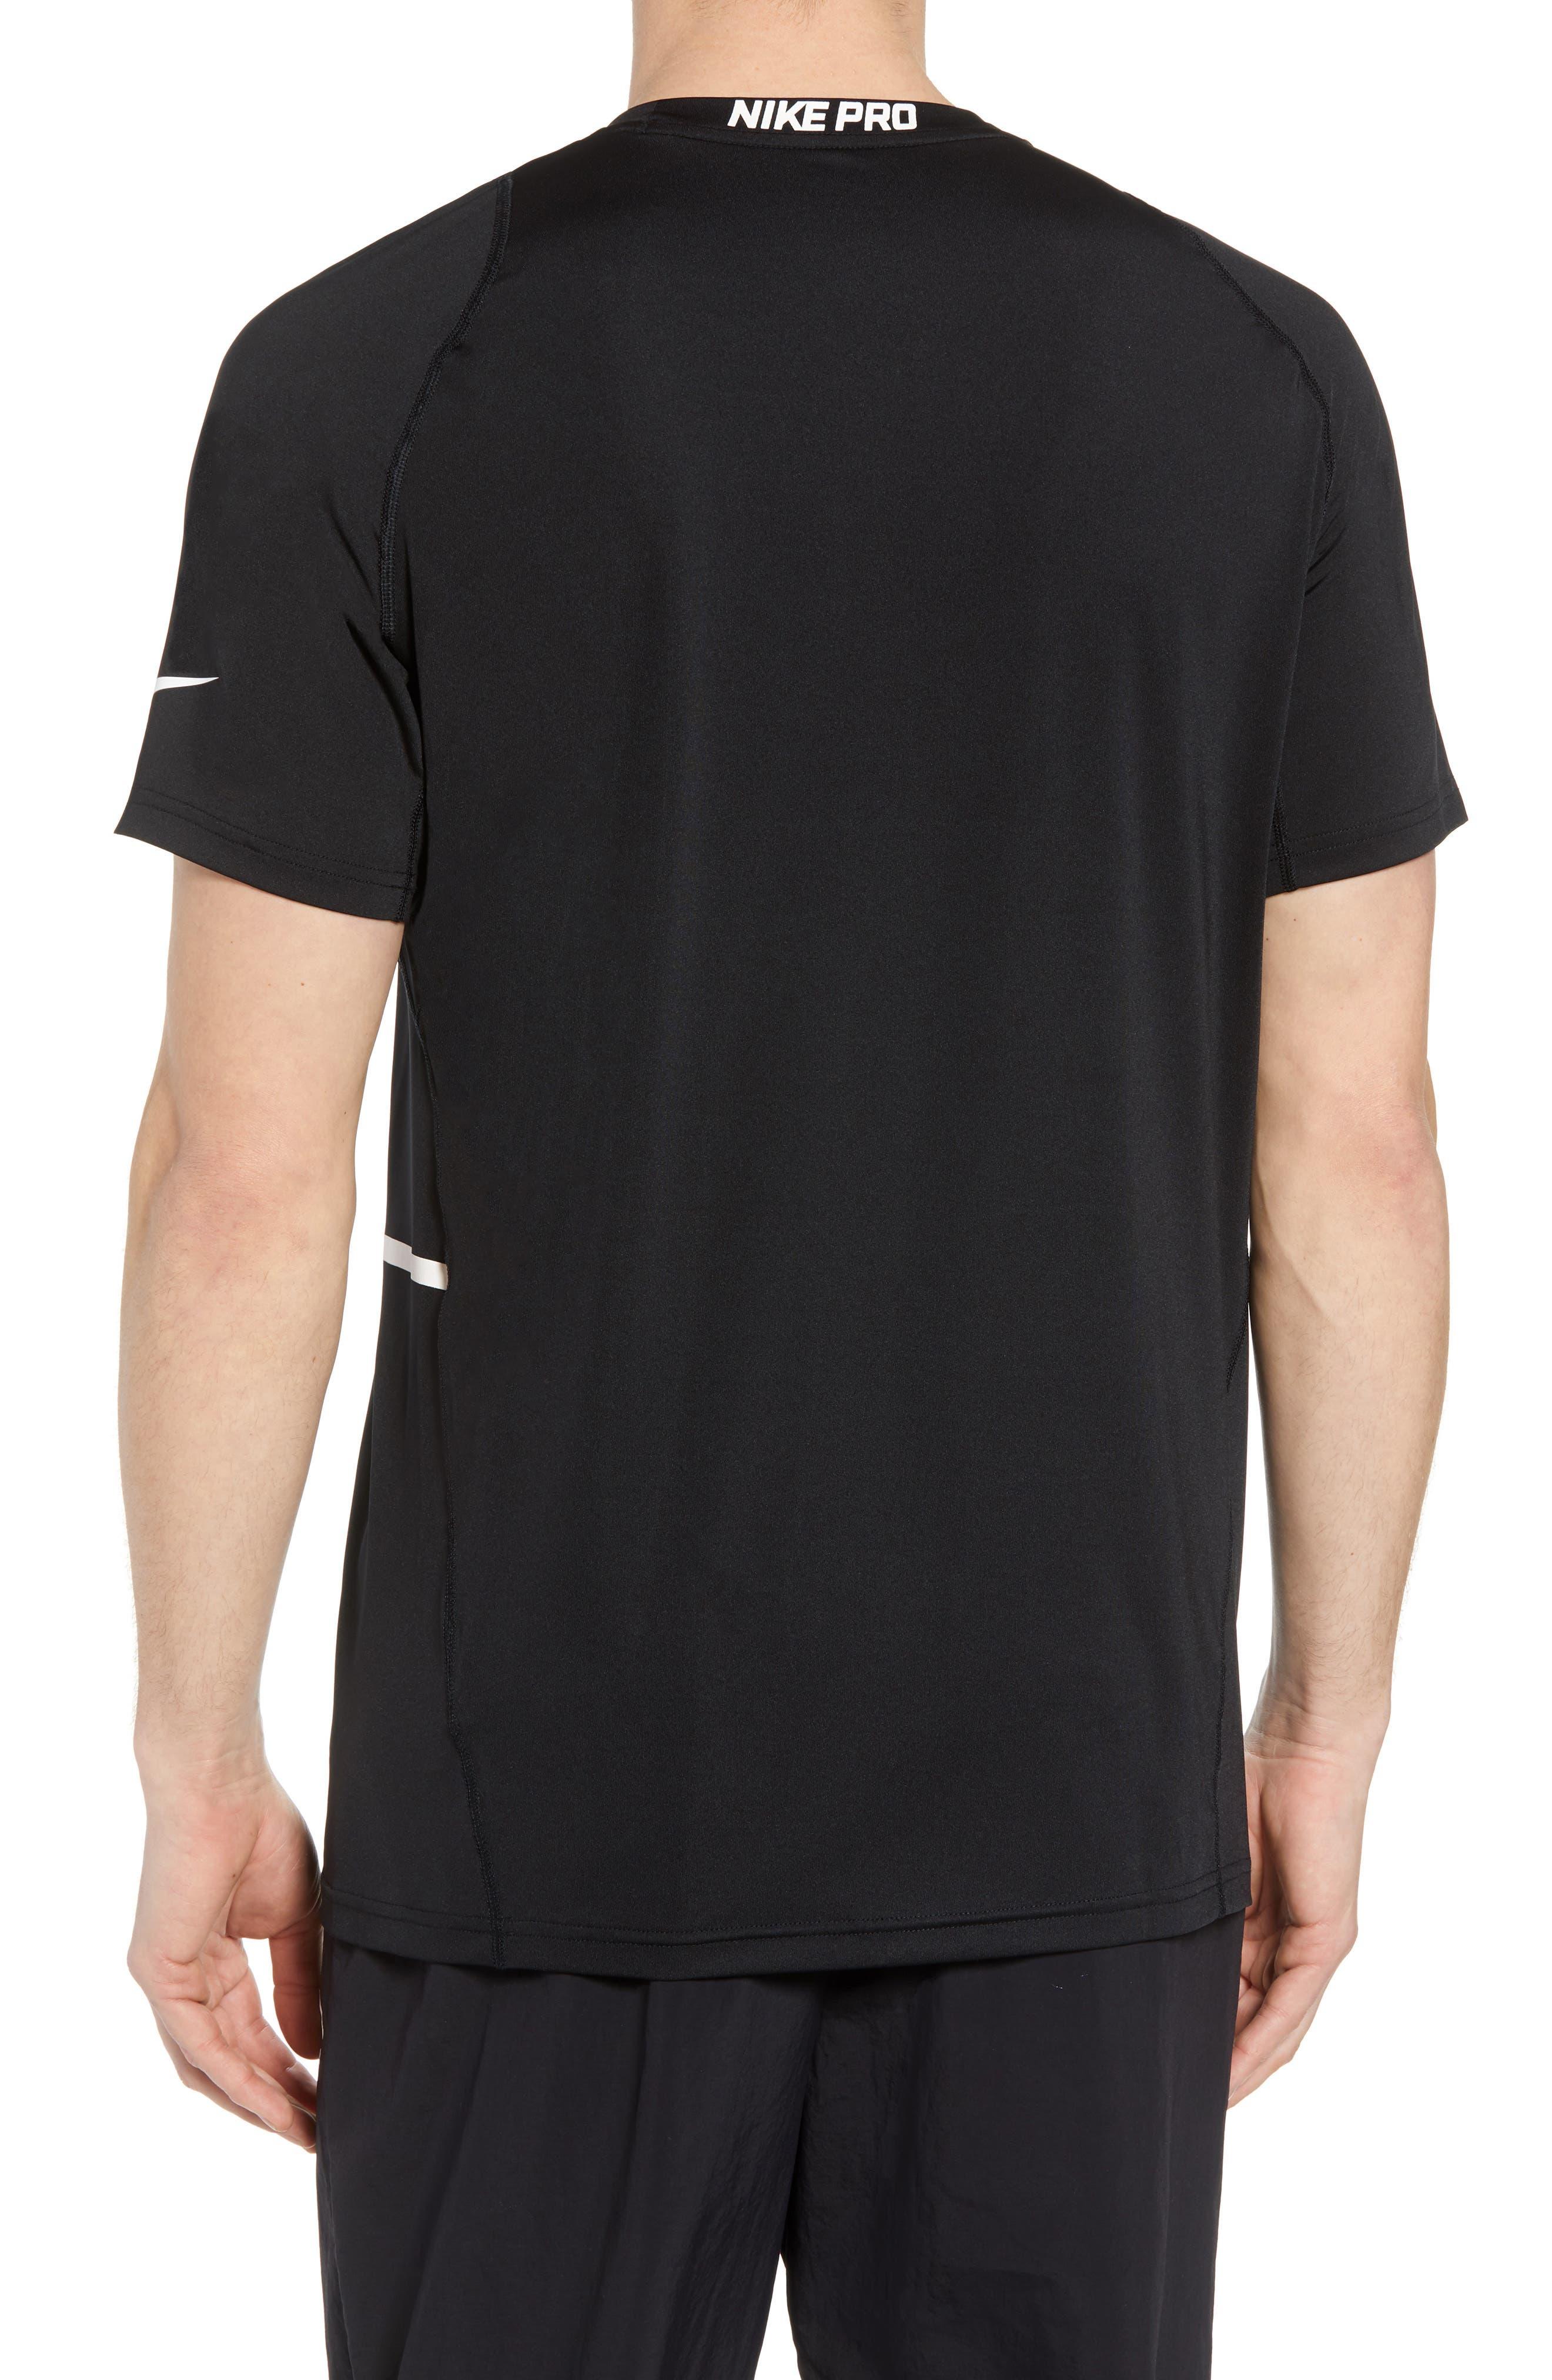 Pro Dry Logo T-Shirt,                             Alternate thumbnail 2, color,                             BLACK/ DARK GREY/ WHITE